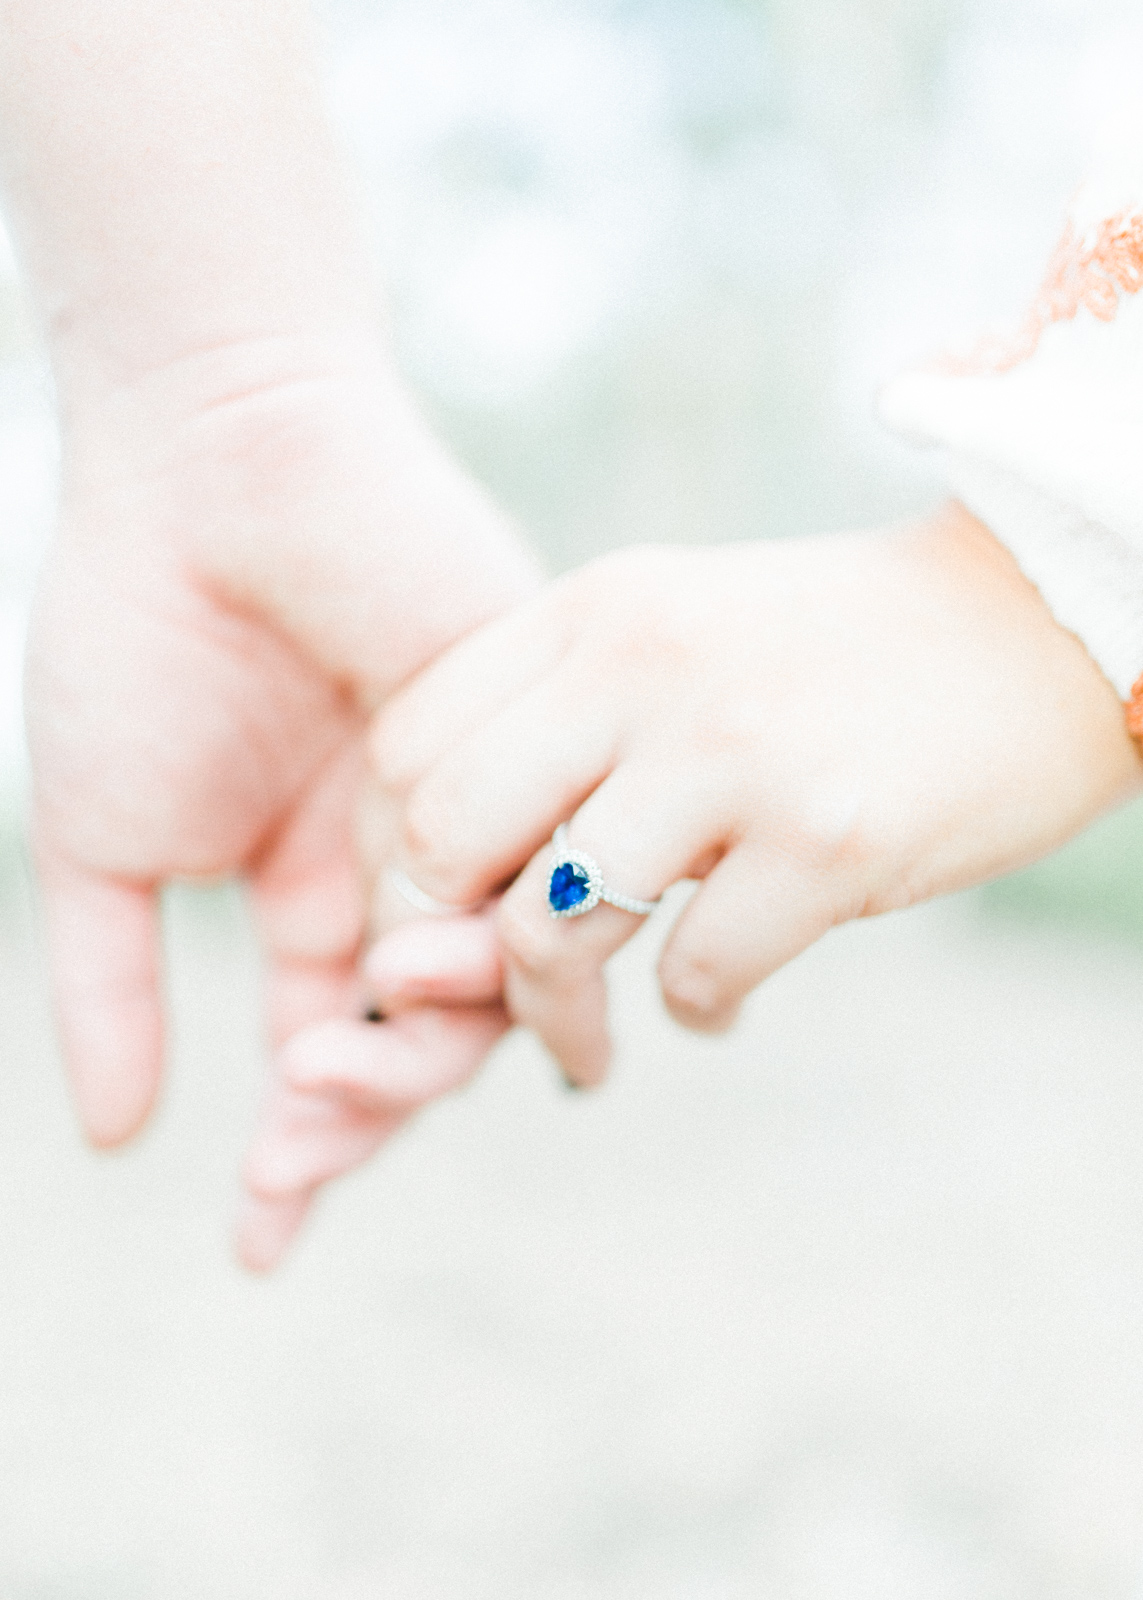 boise-idaho-elopement-engagement-photographer-4533.jpg